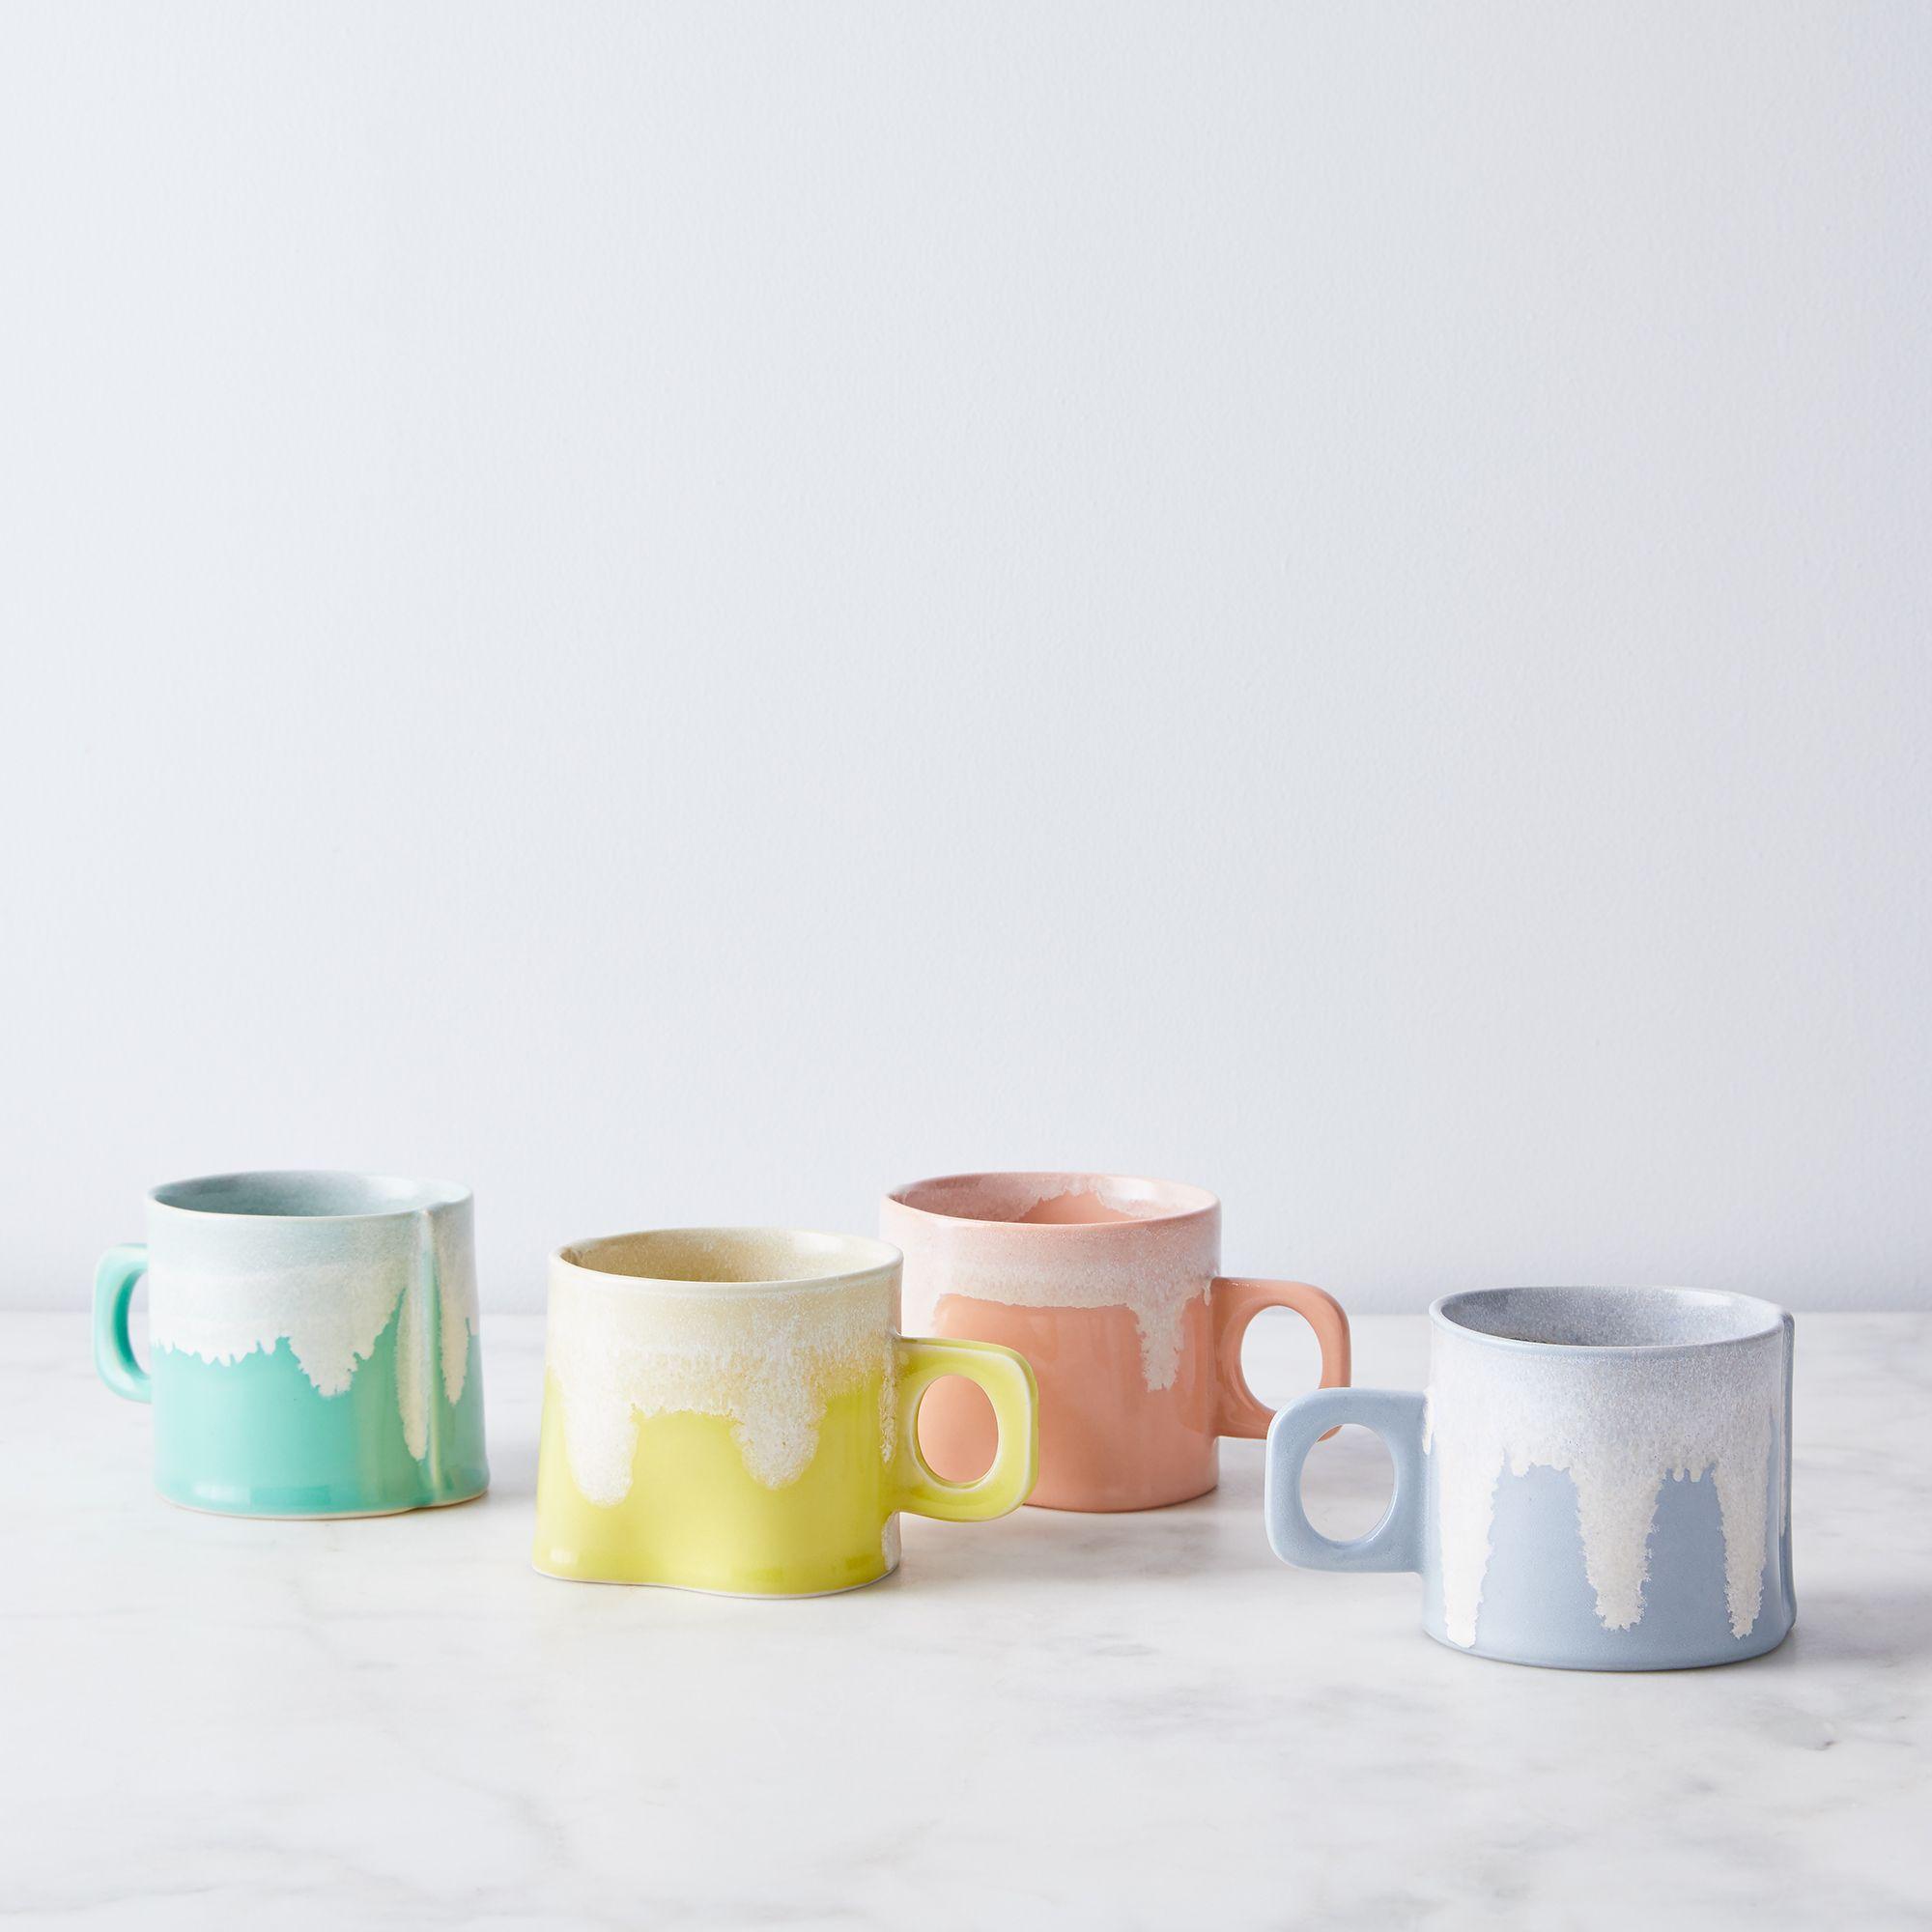 Wilcoxson Brooklyn Ceramics Handmade Color Drip Mug - Set of 4